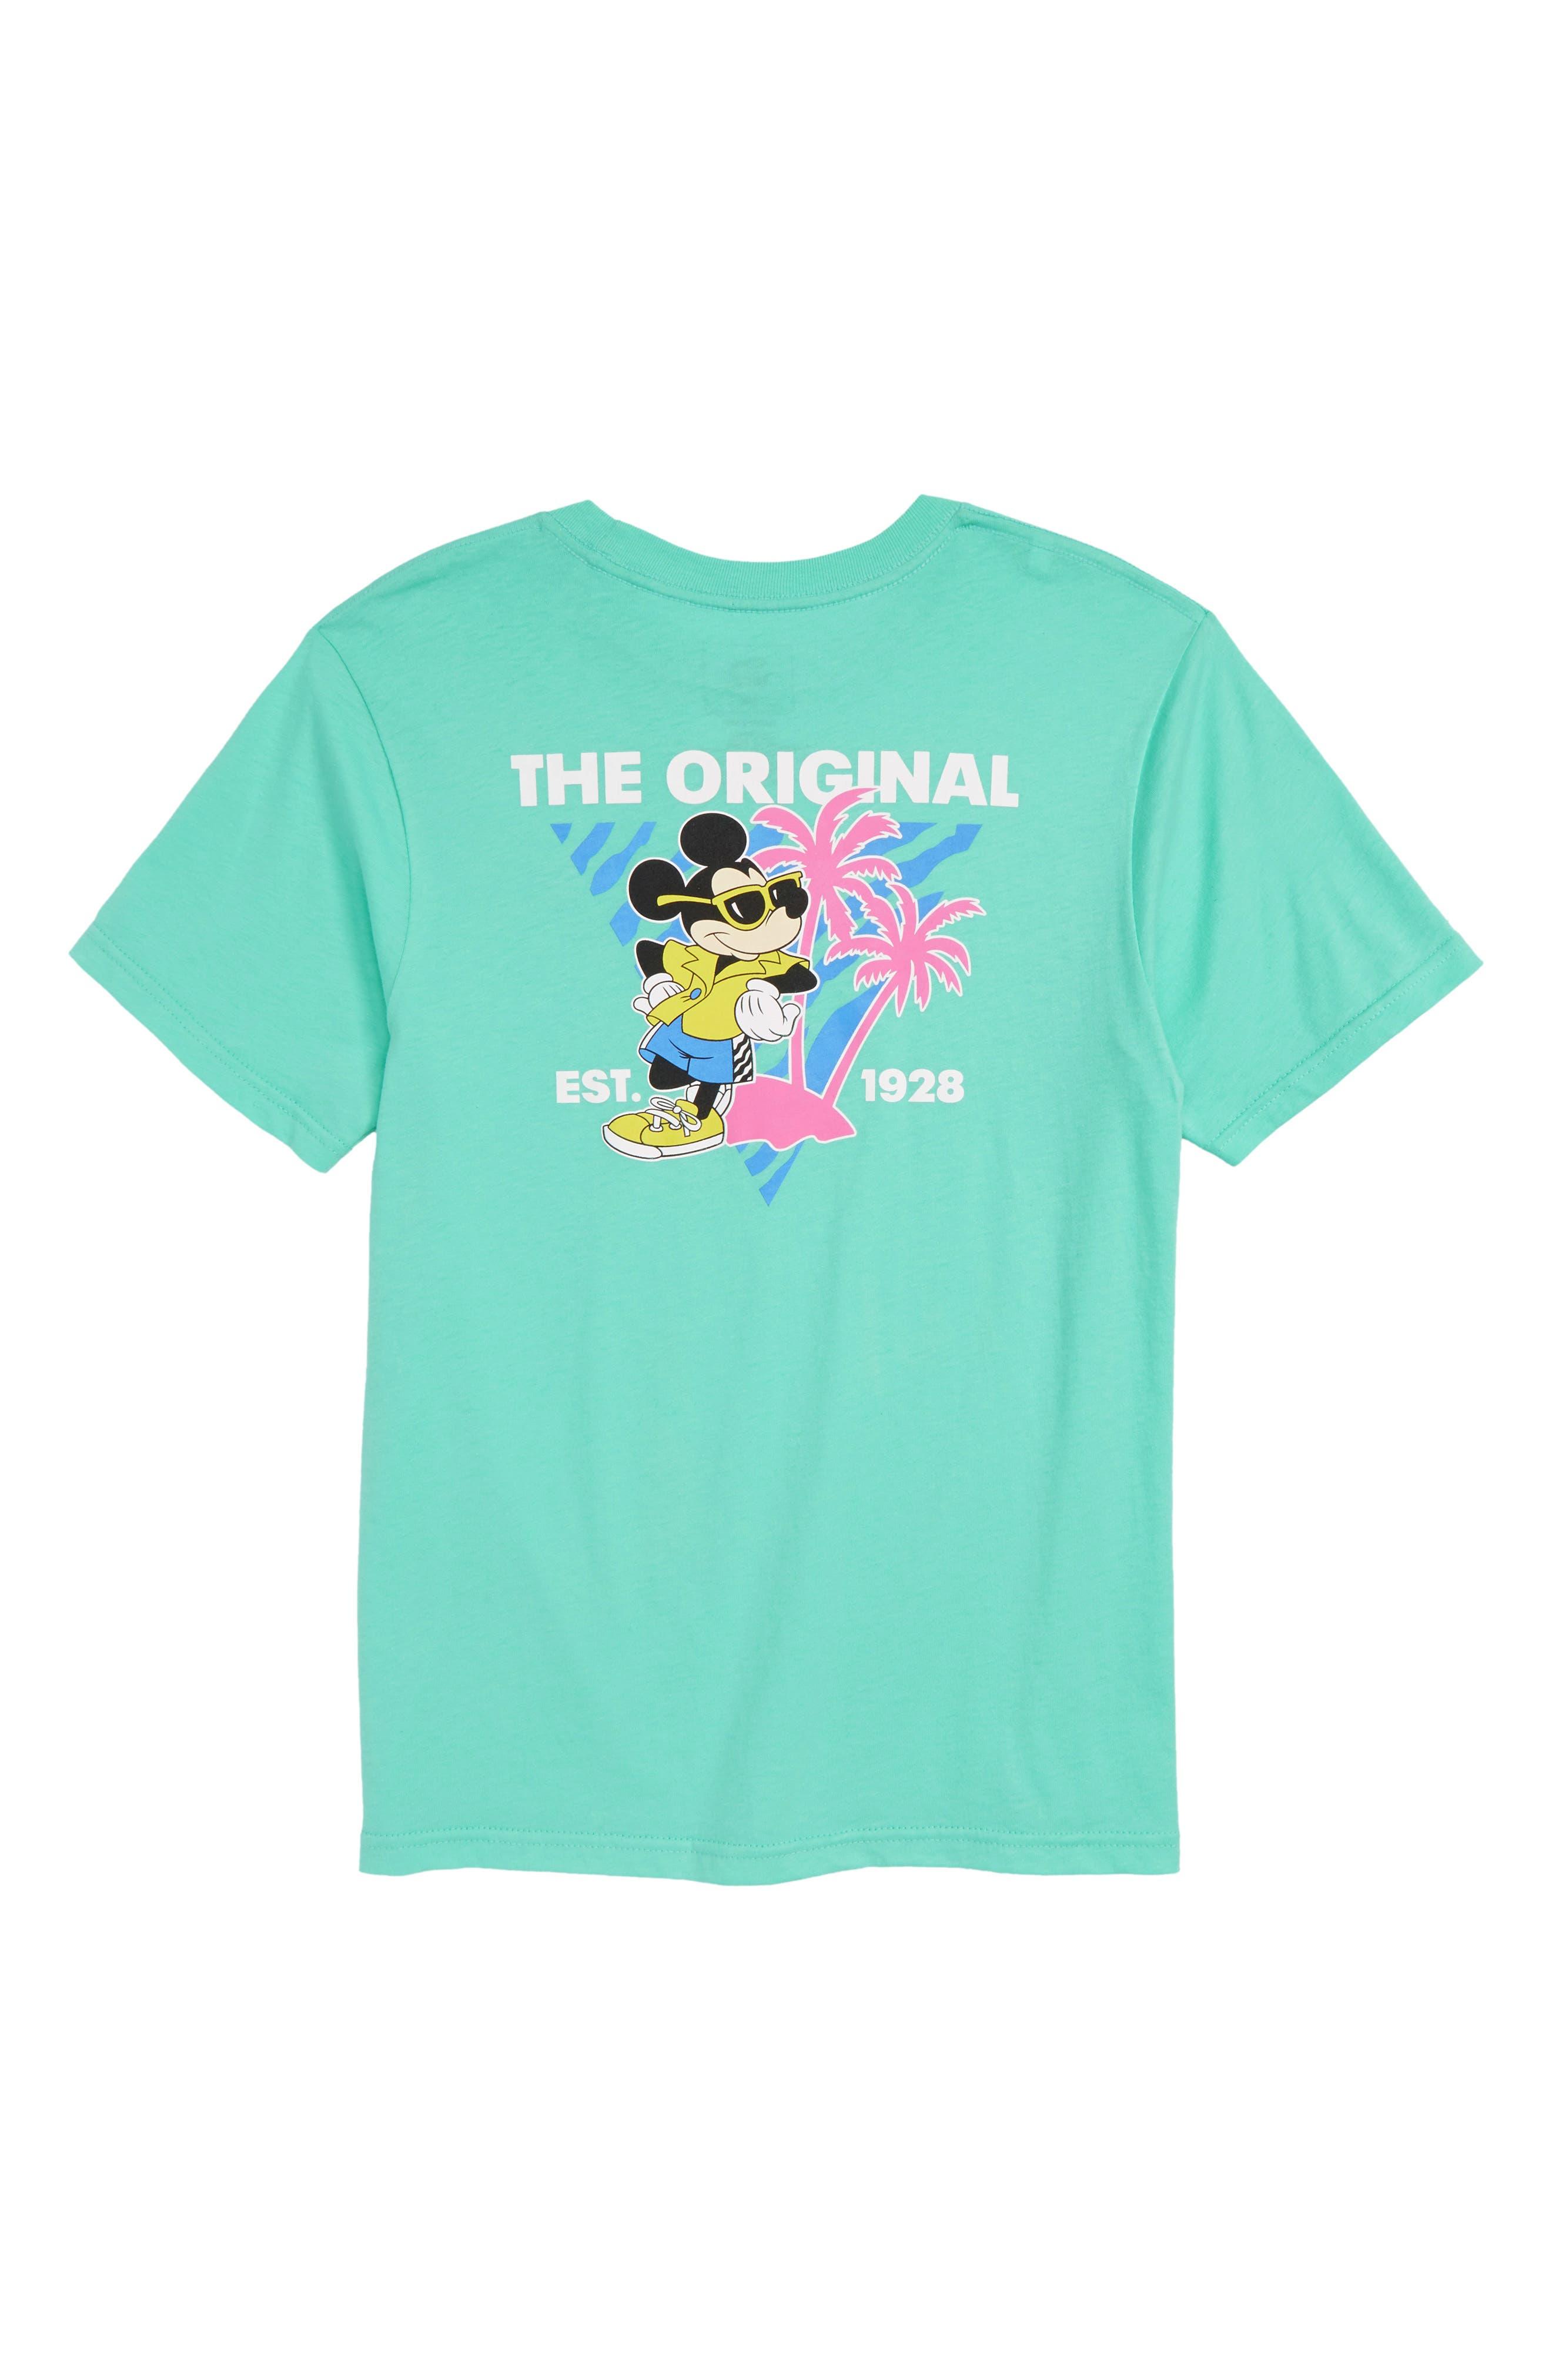 x Disney Mickey's 90th Anniversary Classic T-Shirt,                             Alternate thumbnail 2, color,                             300